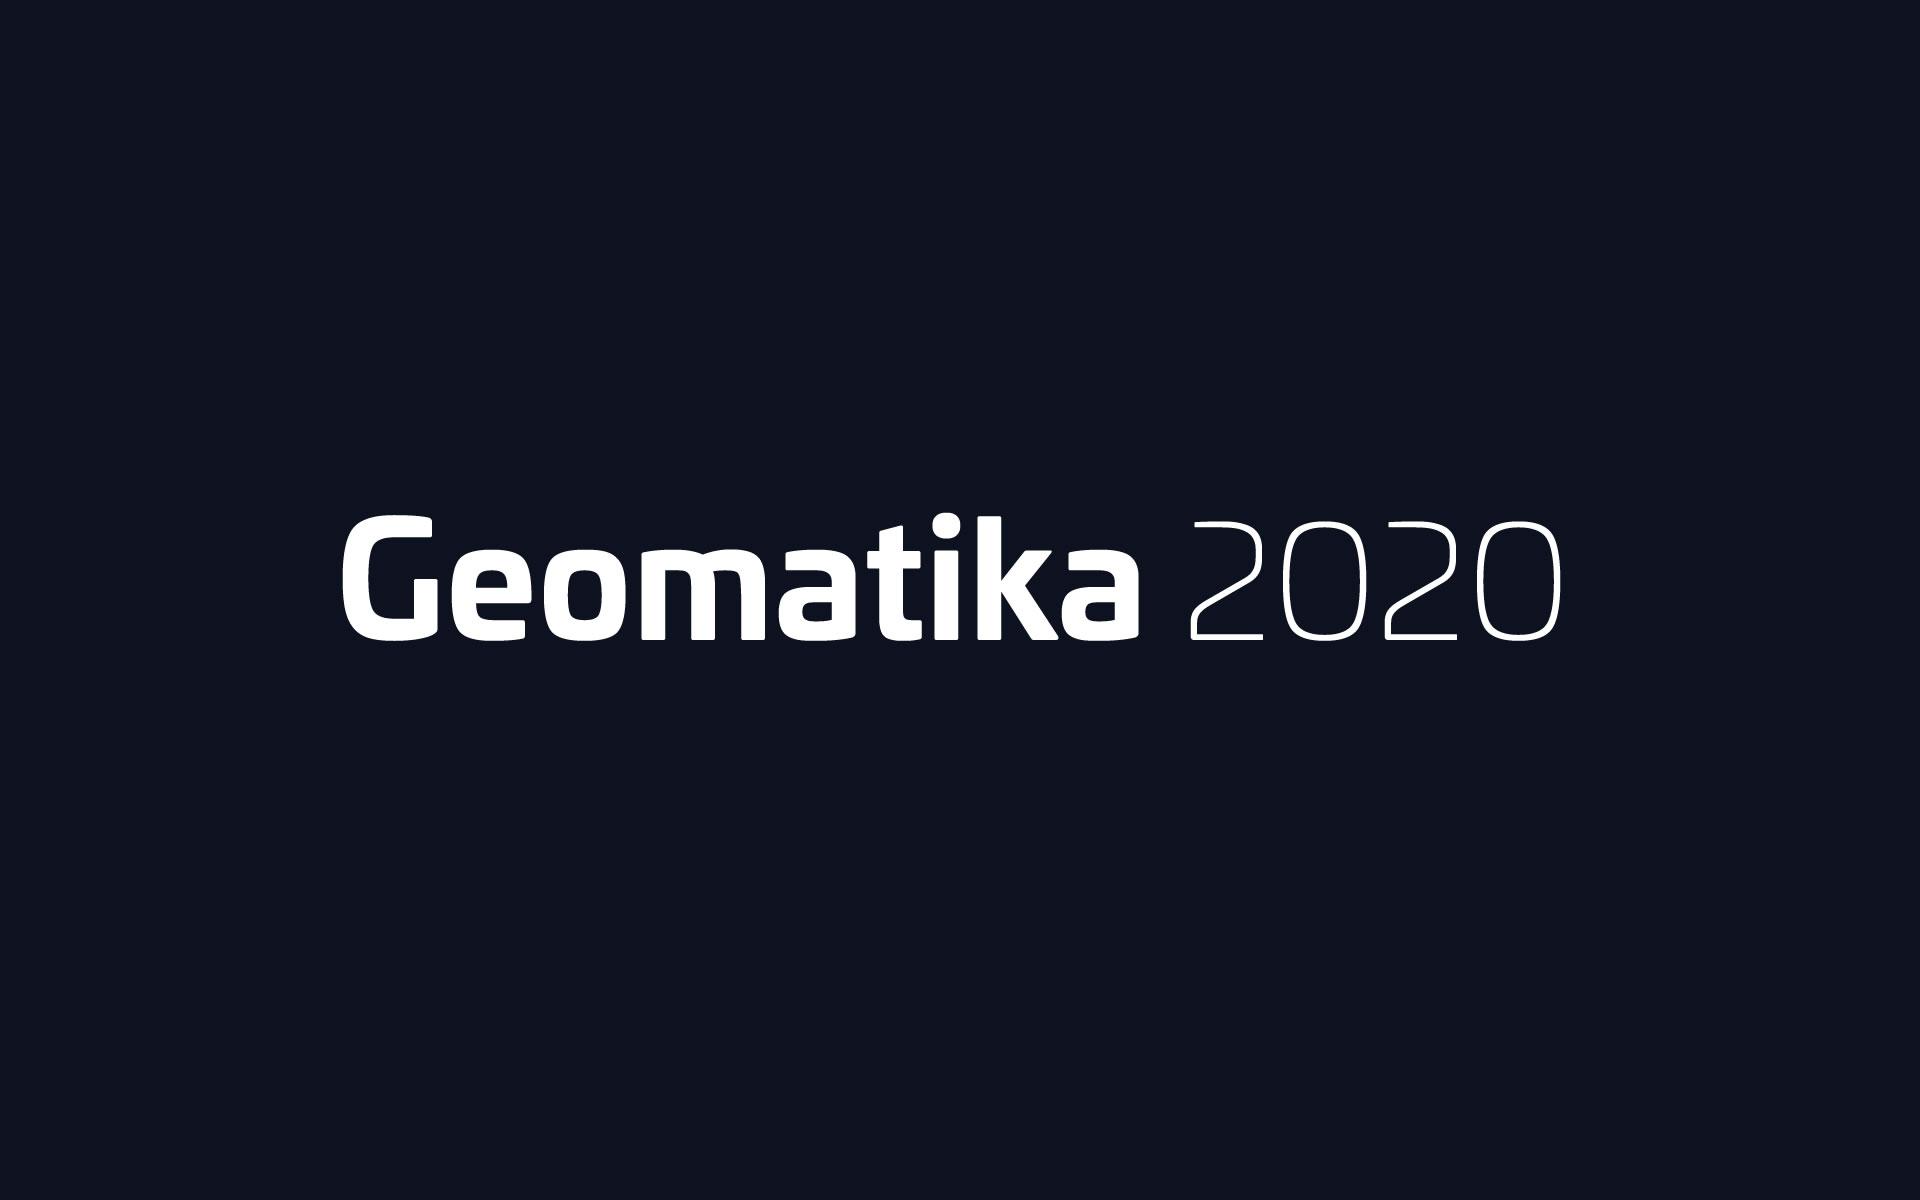 geomatika-2020-konference-apg-feat